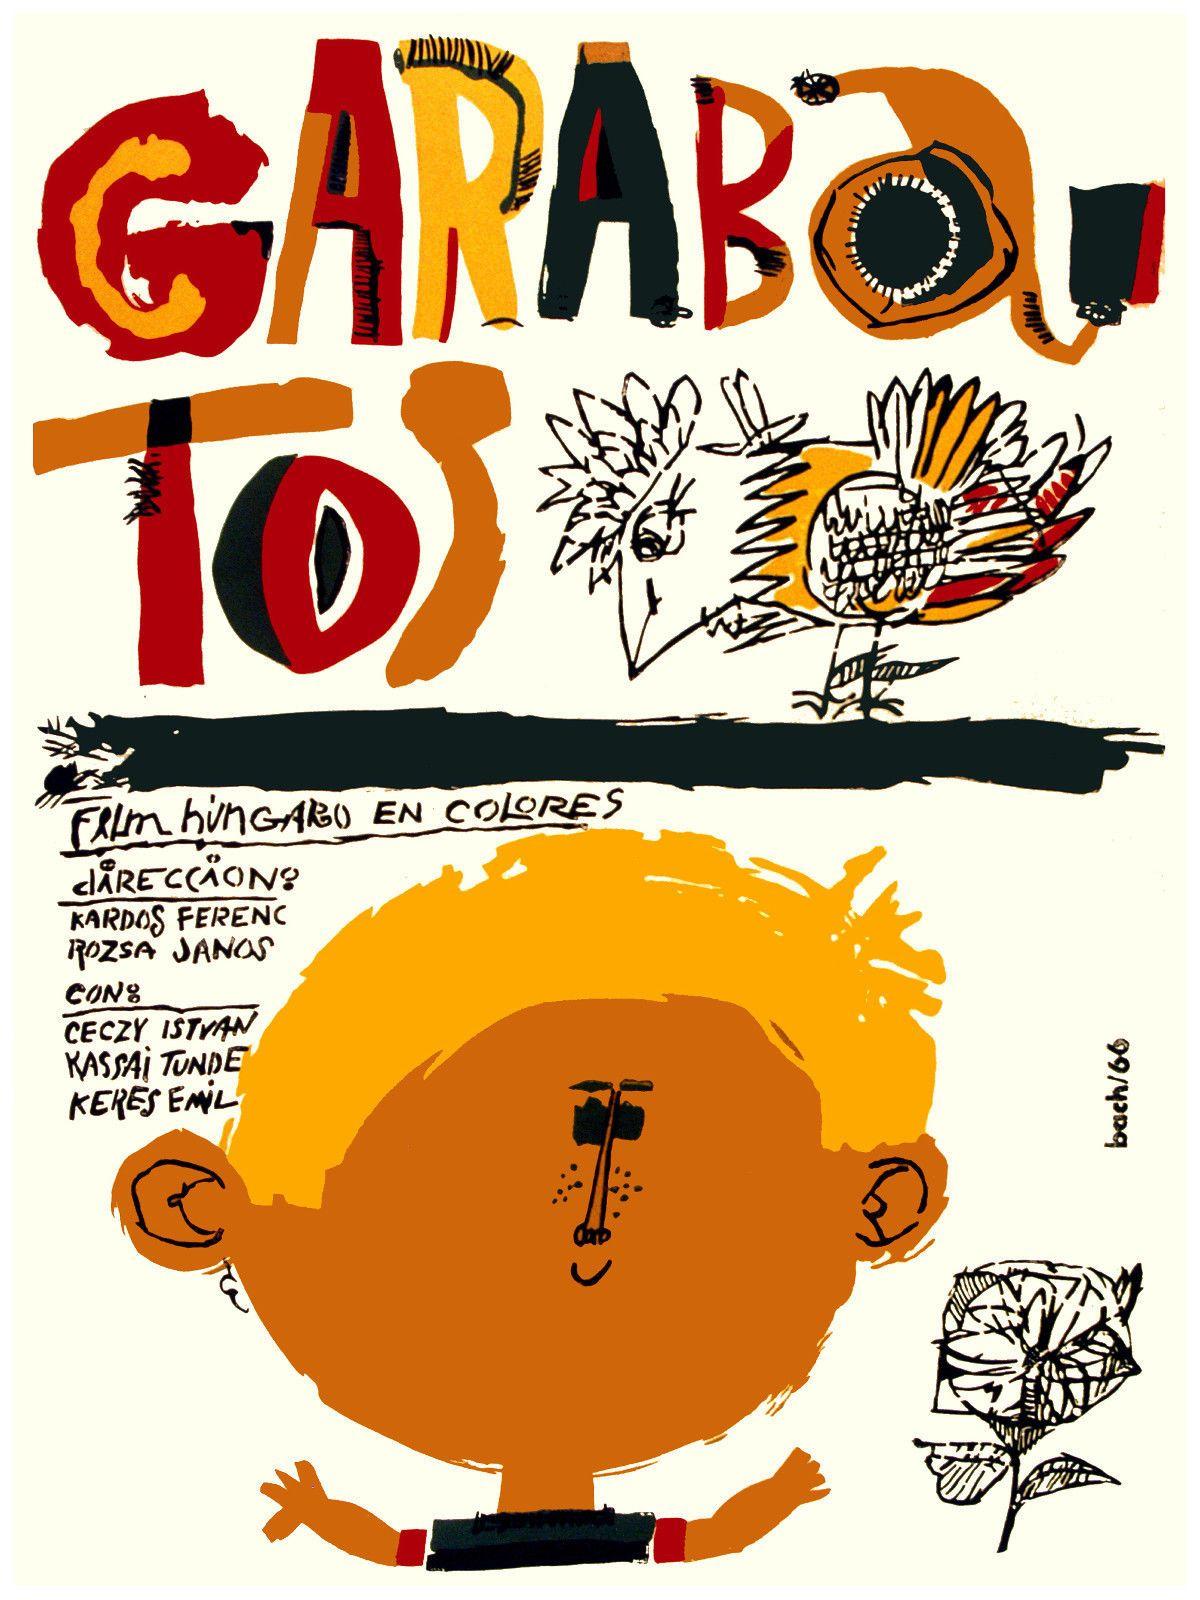 Cuban decor Graphic Design movie Poster for ARGENTINA found Children.film